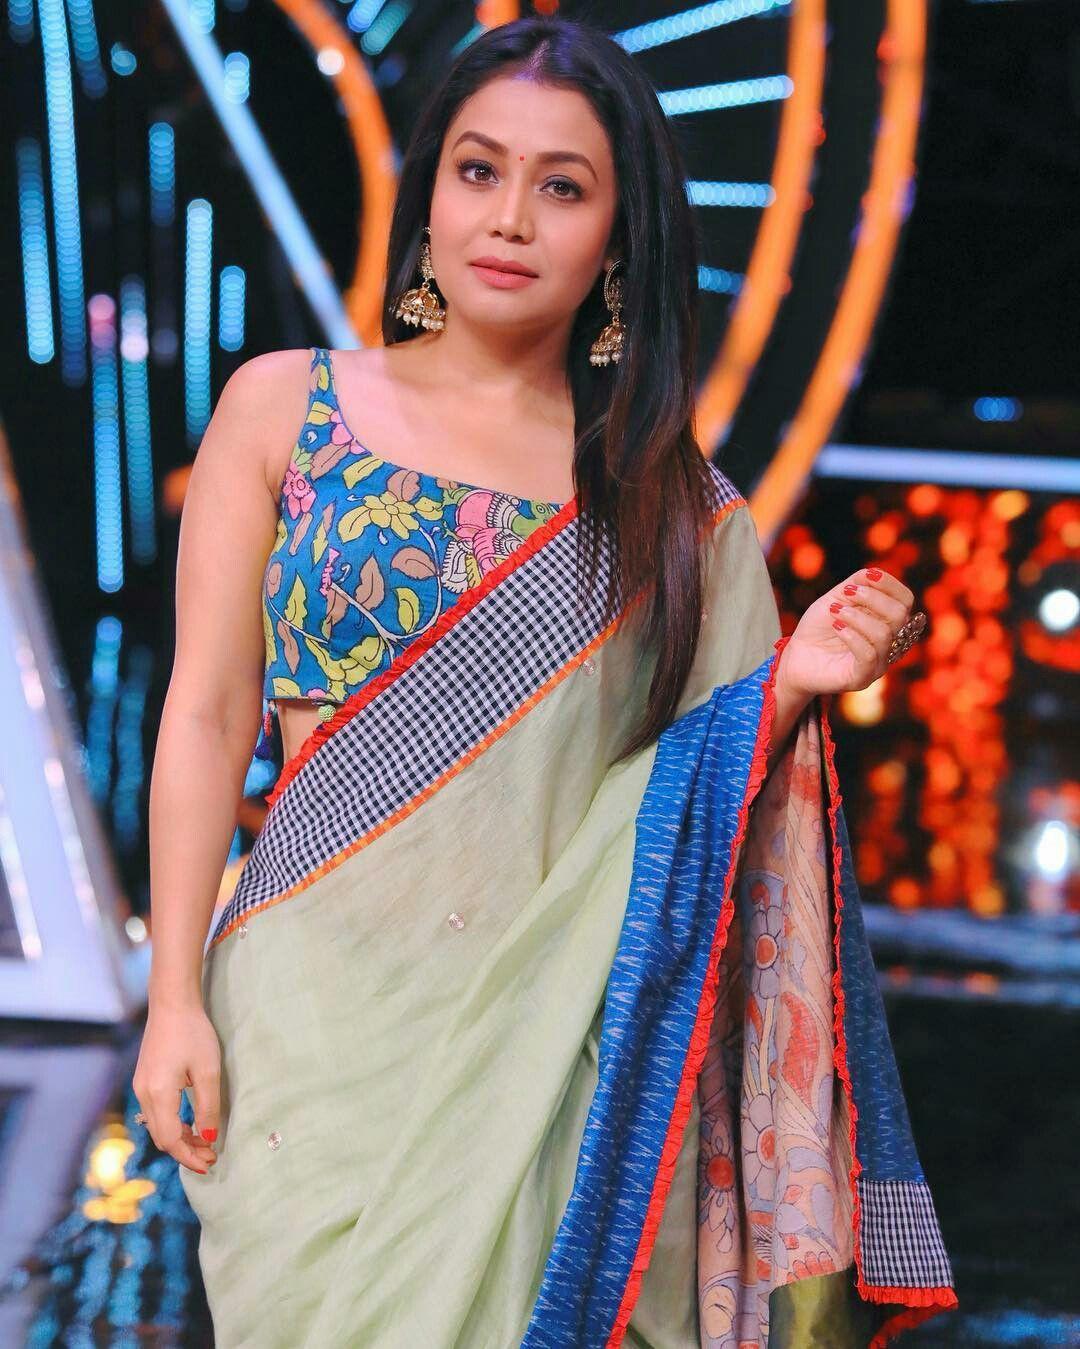 Neha kakkar | Celebrity outfits, Neha kakkar, Indian celebrities